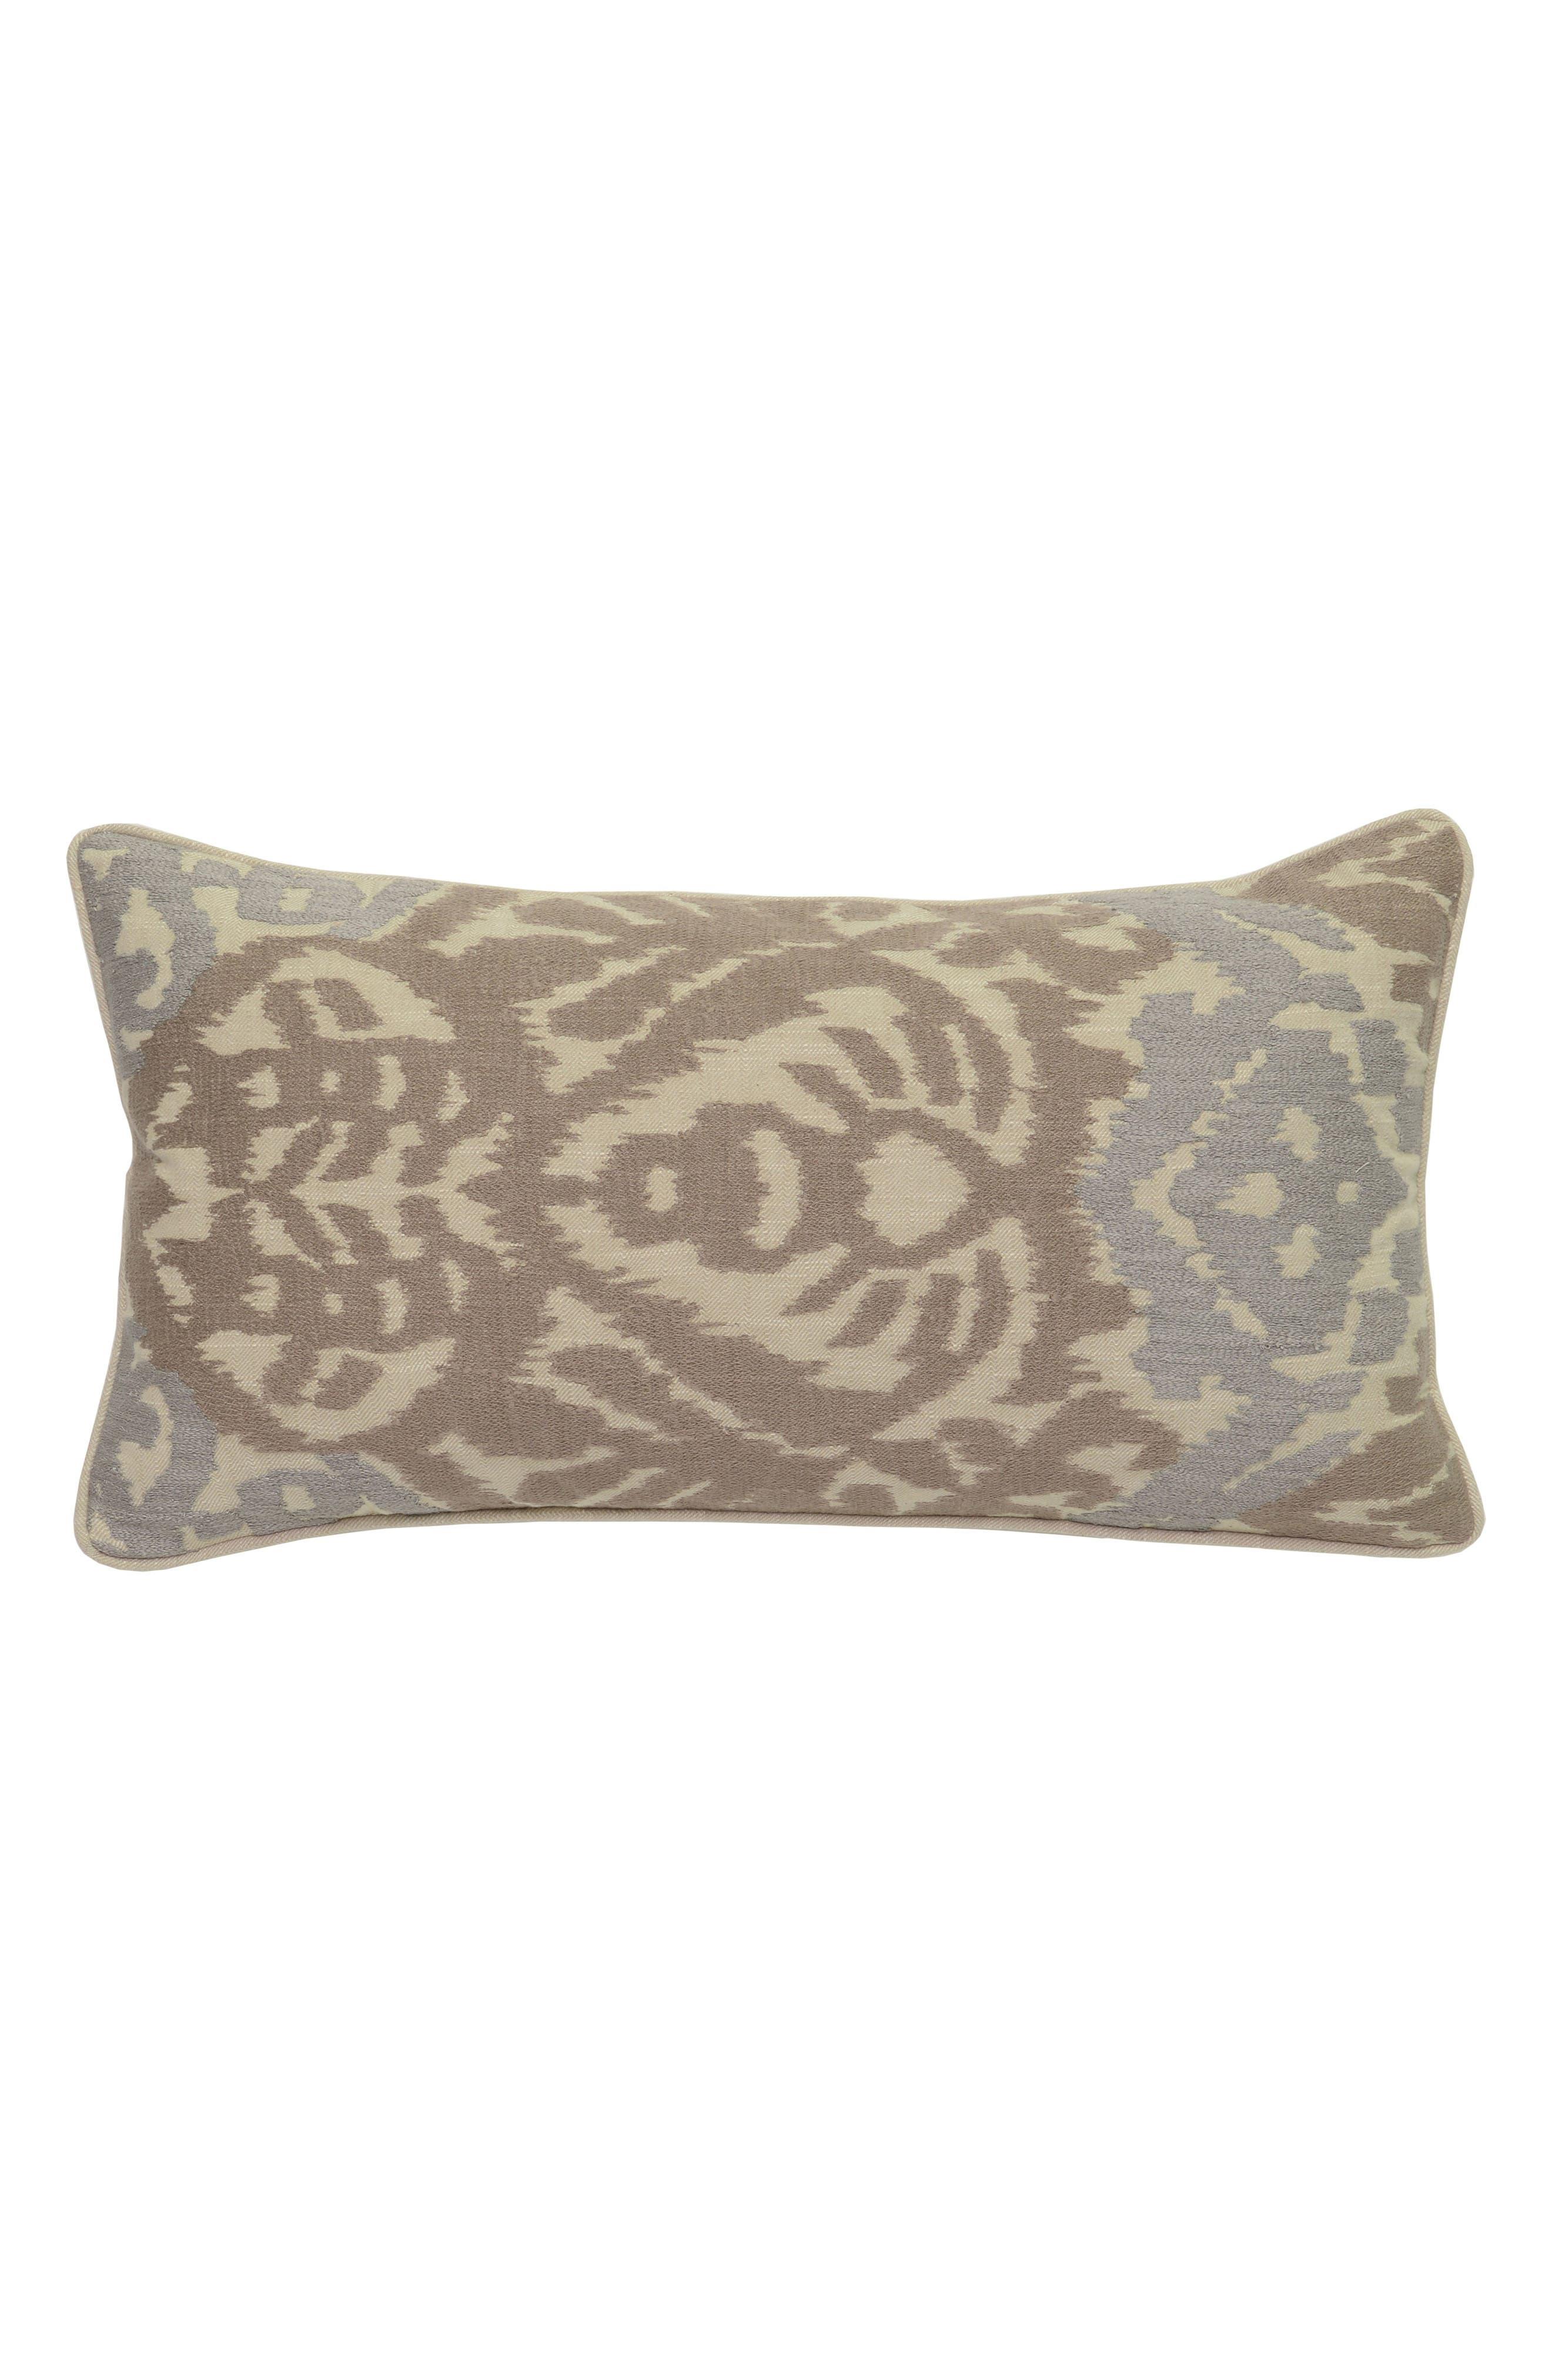 Alternate Image 1 Selected - Villa Home Collection Rena Pillow